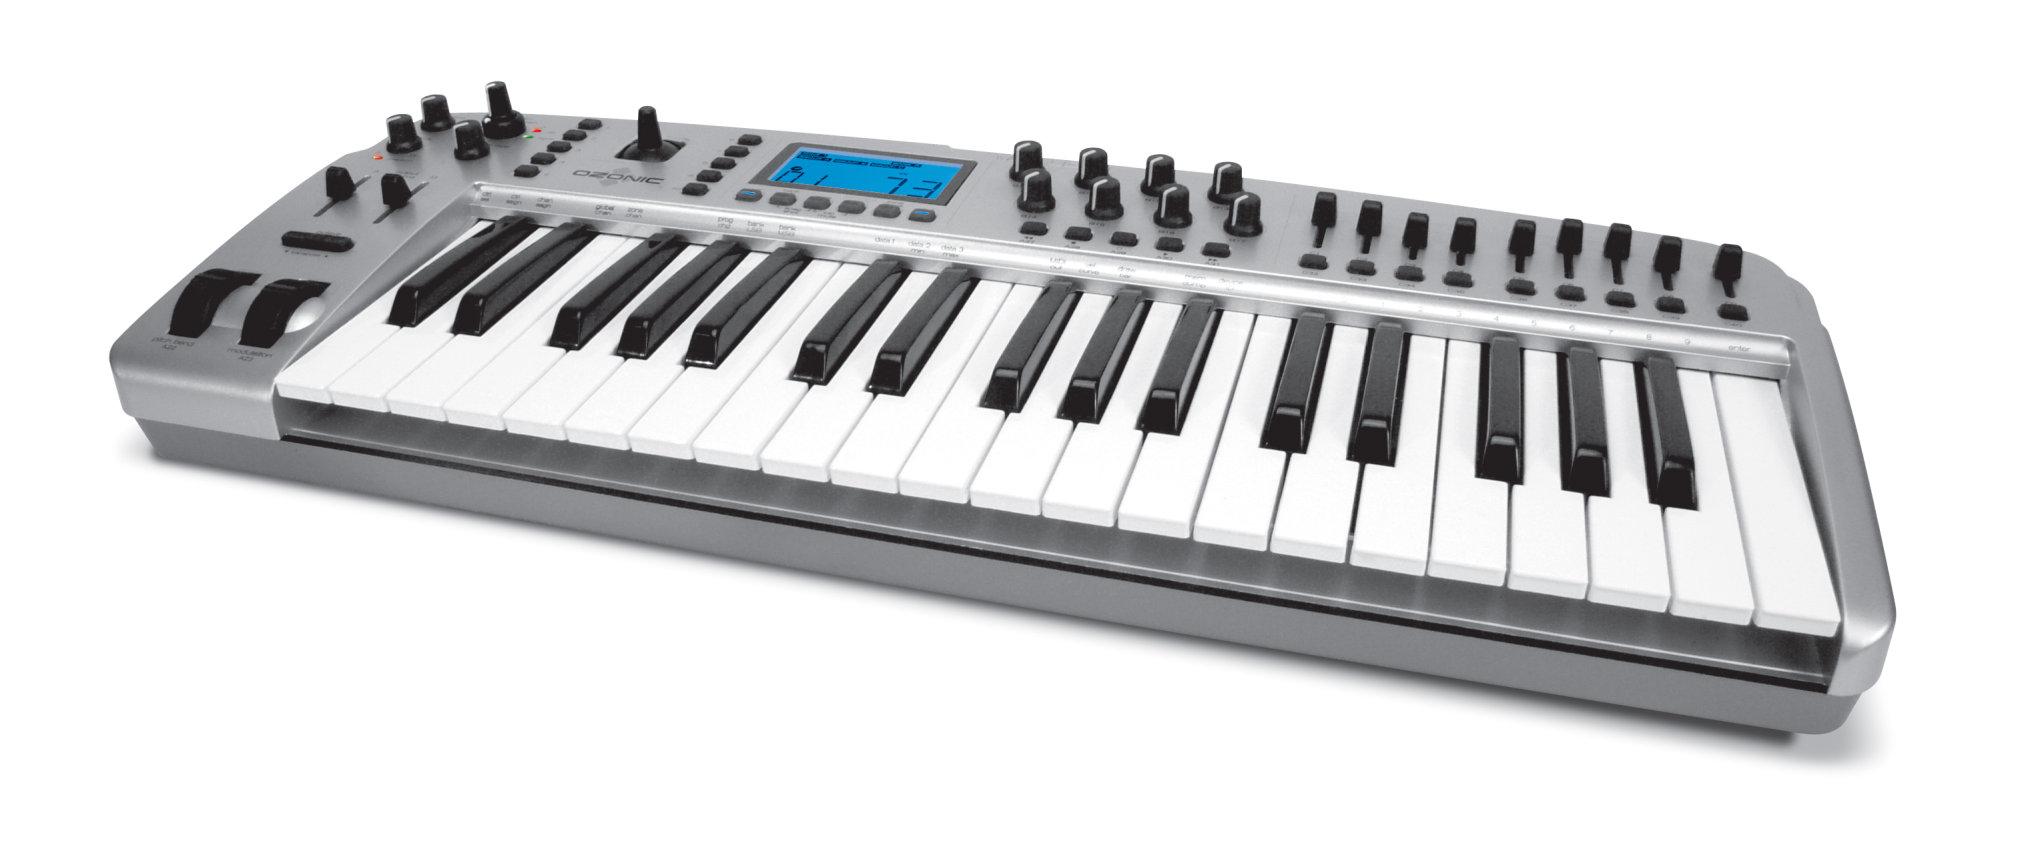 M Audio Ozonic Keyboard